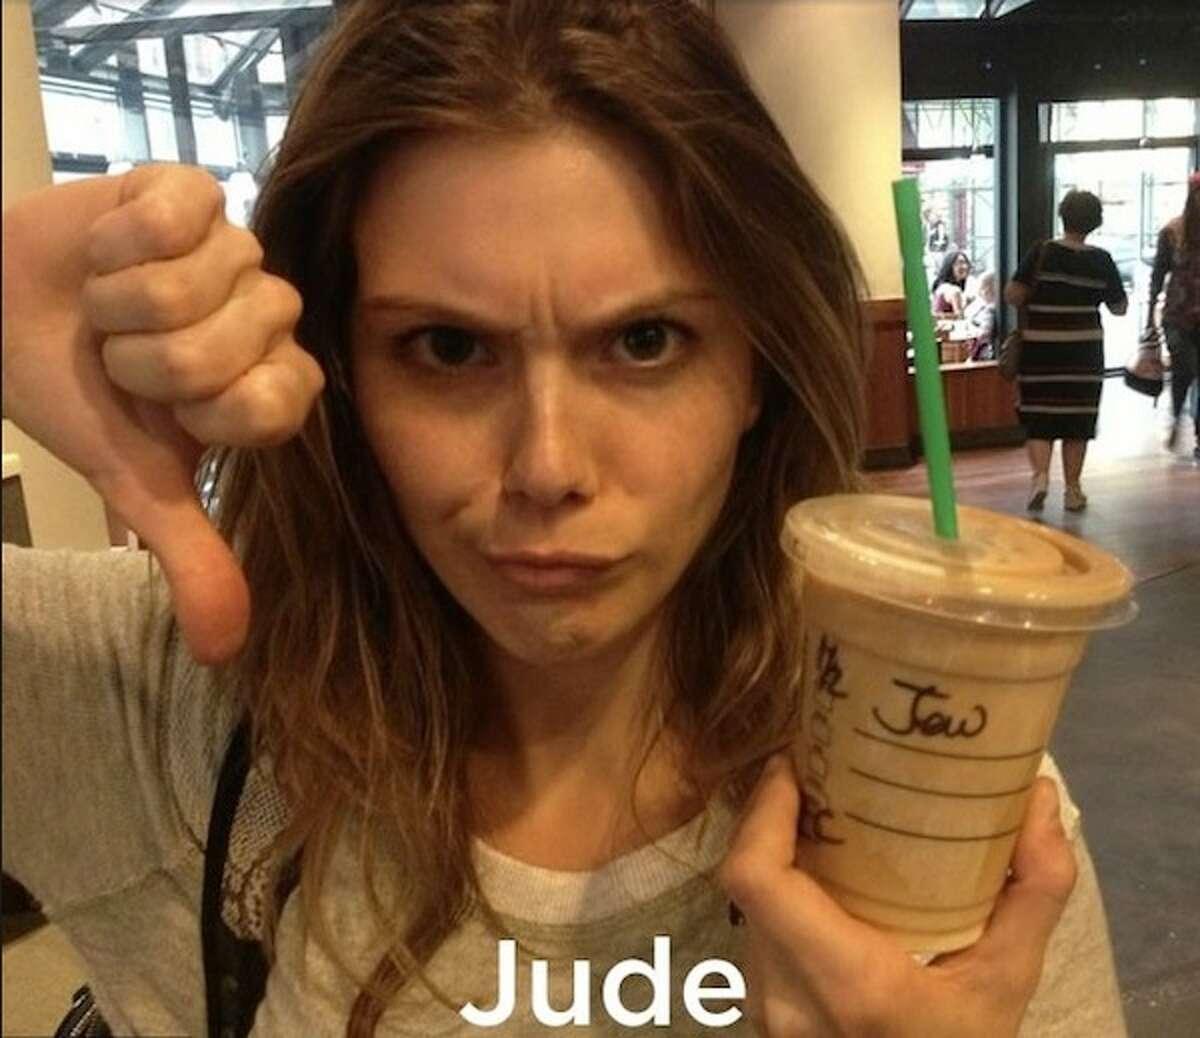 Jude AKA Jew credit: Imgur.com Low blow, Starbucks. Source: Imgur.com